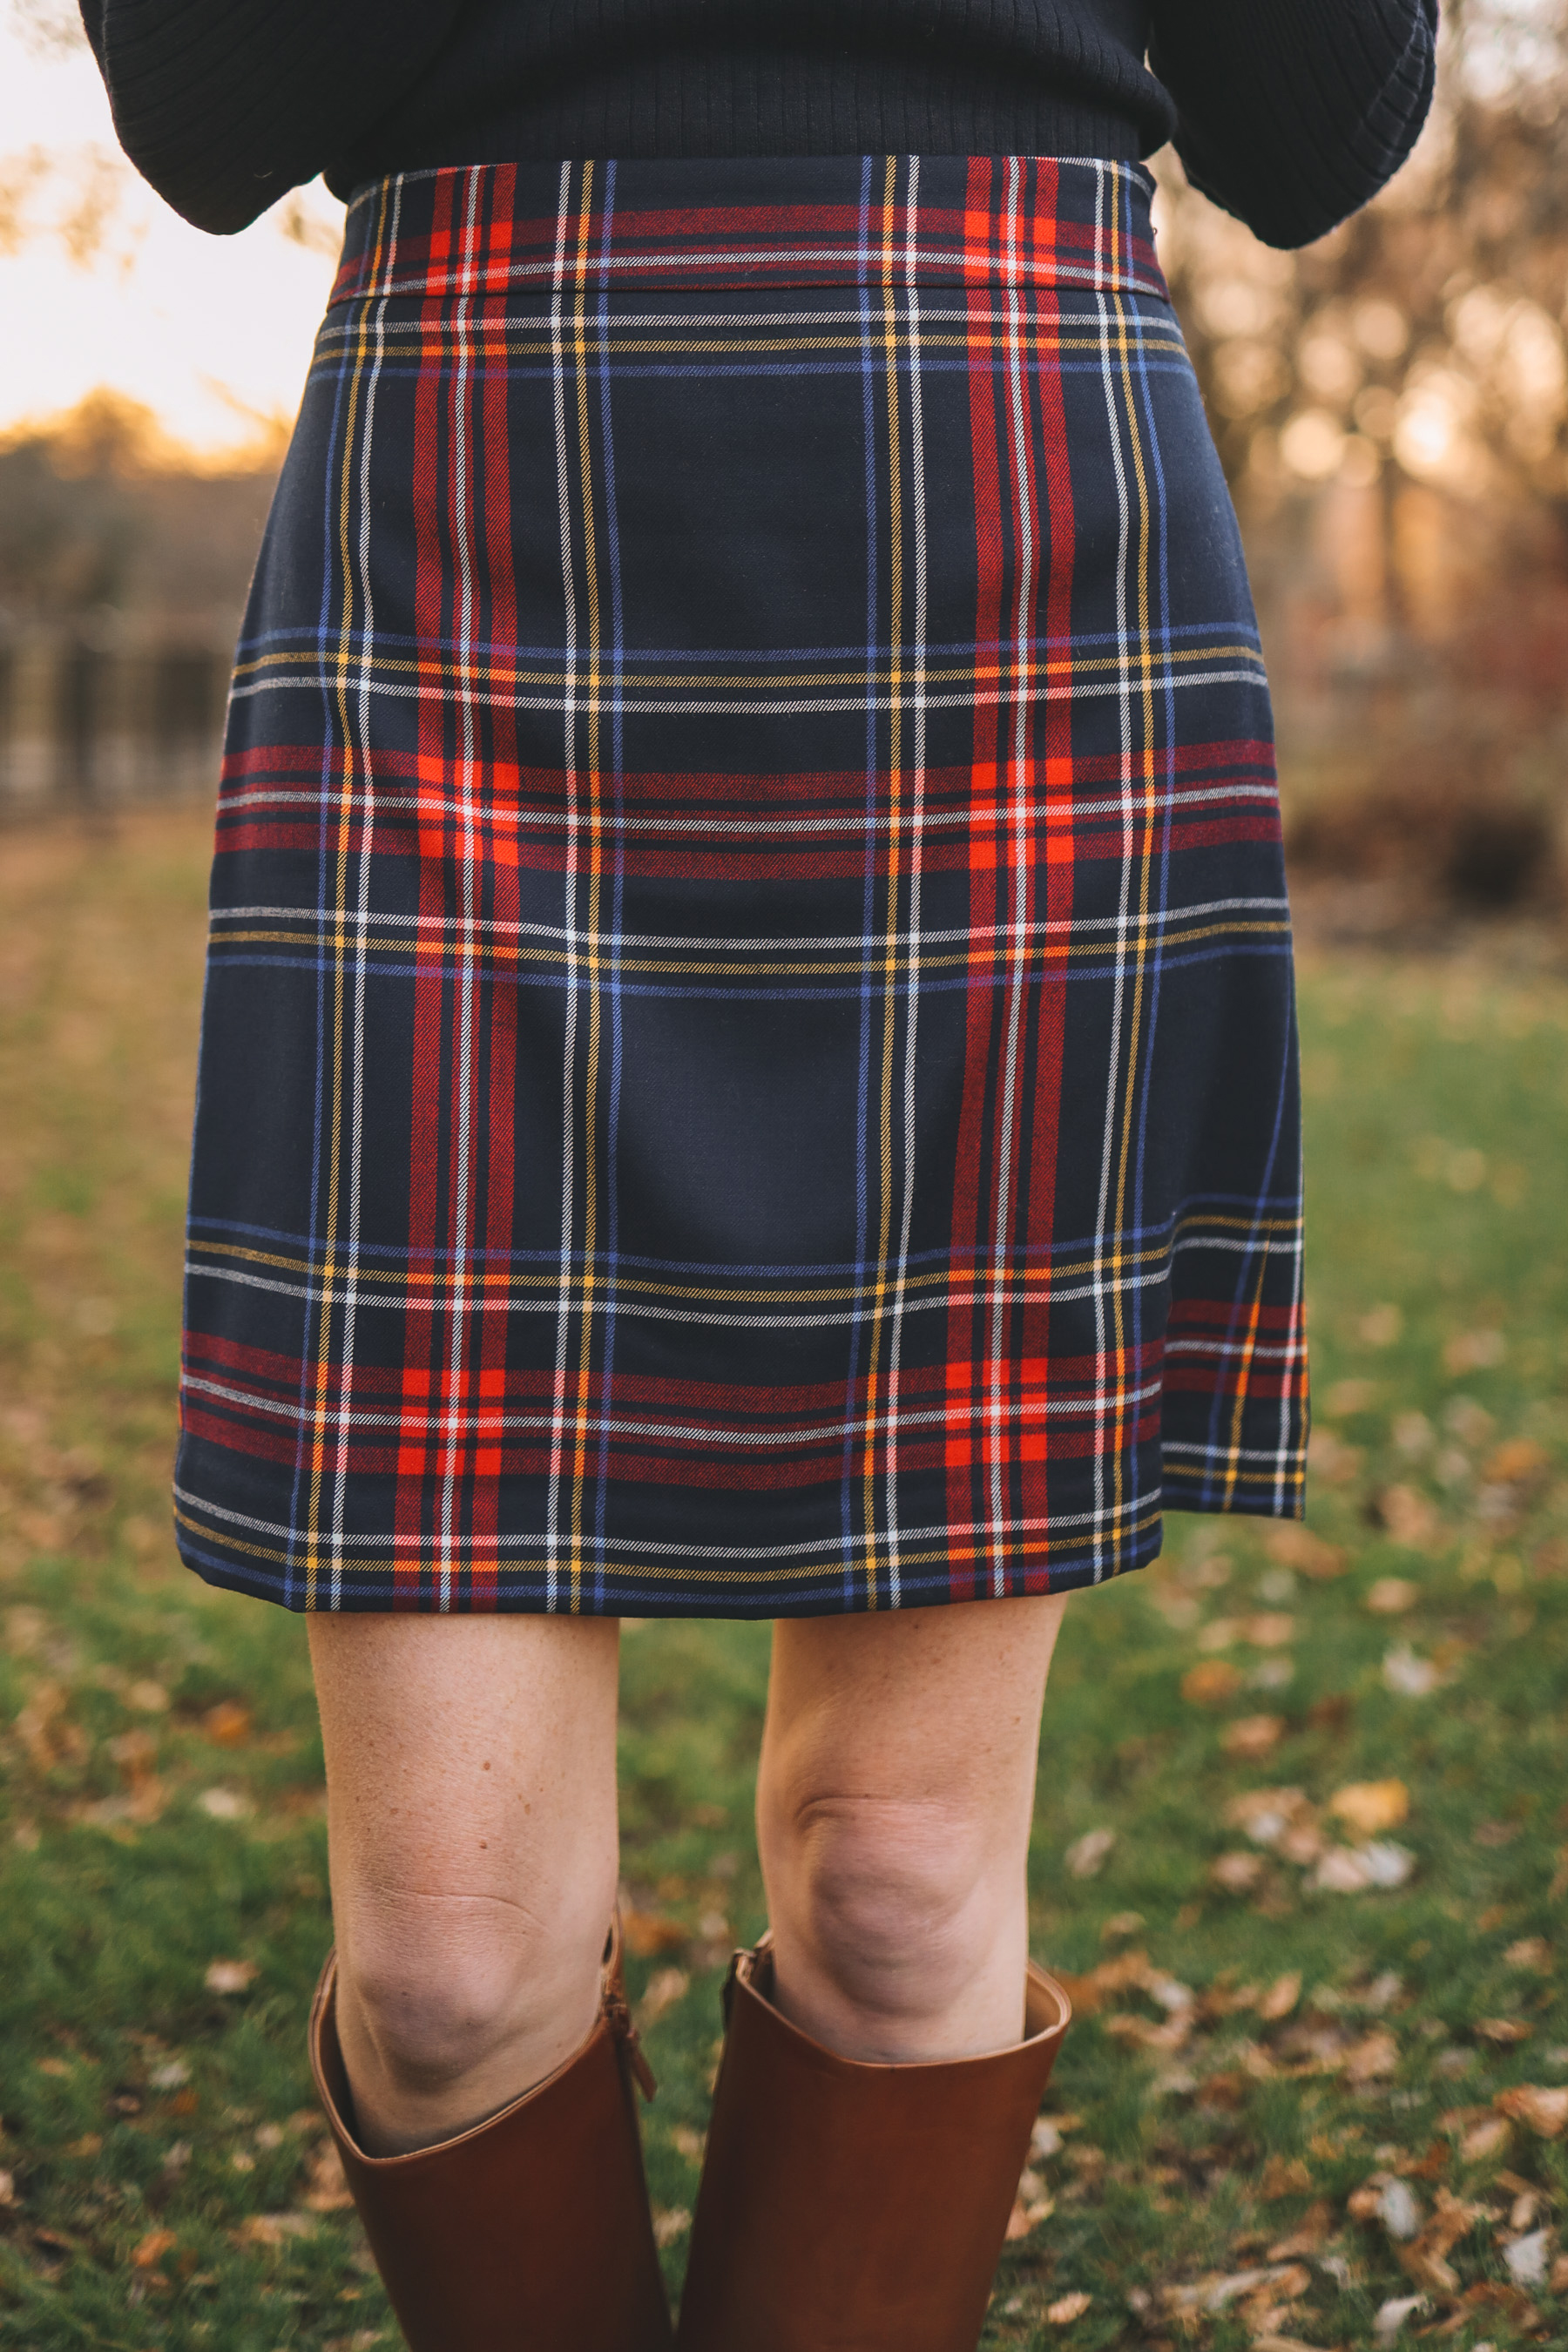 Tartan Skirt and Riding Boots